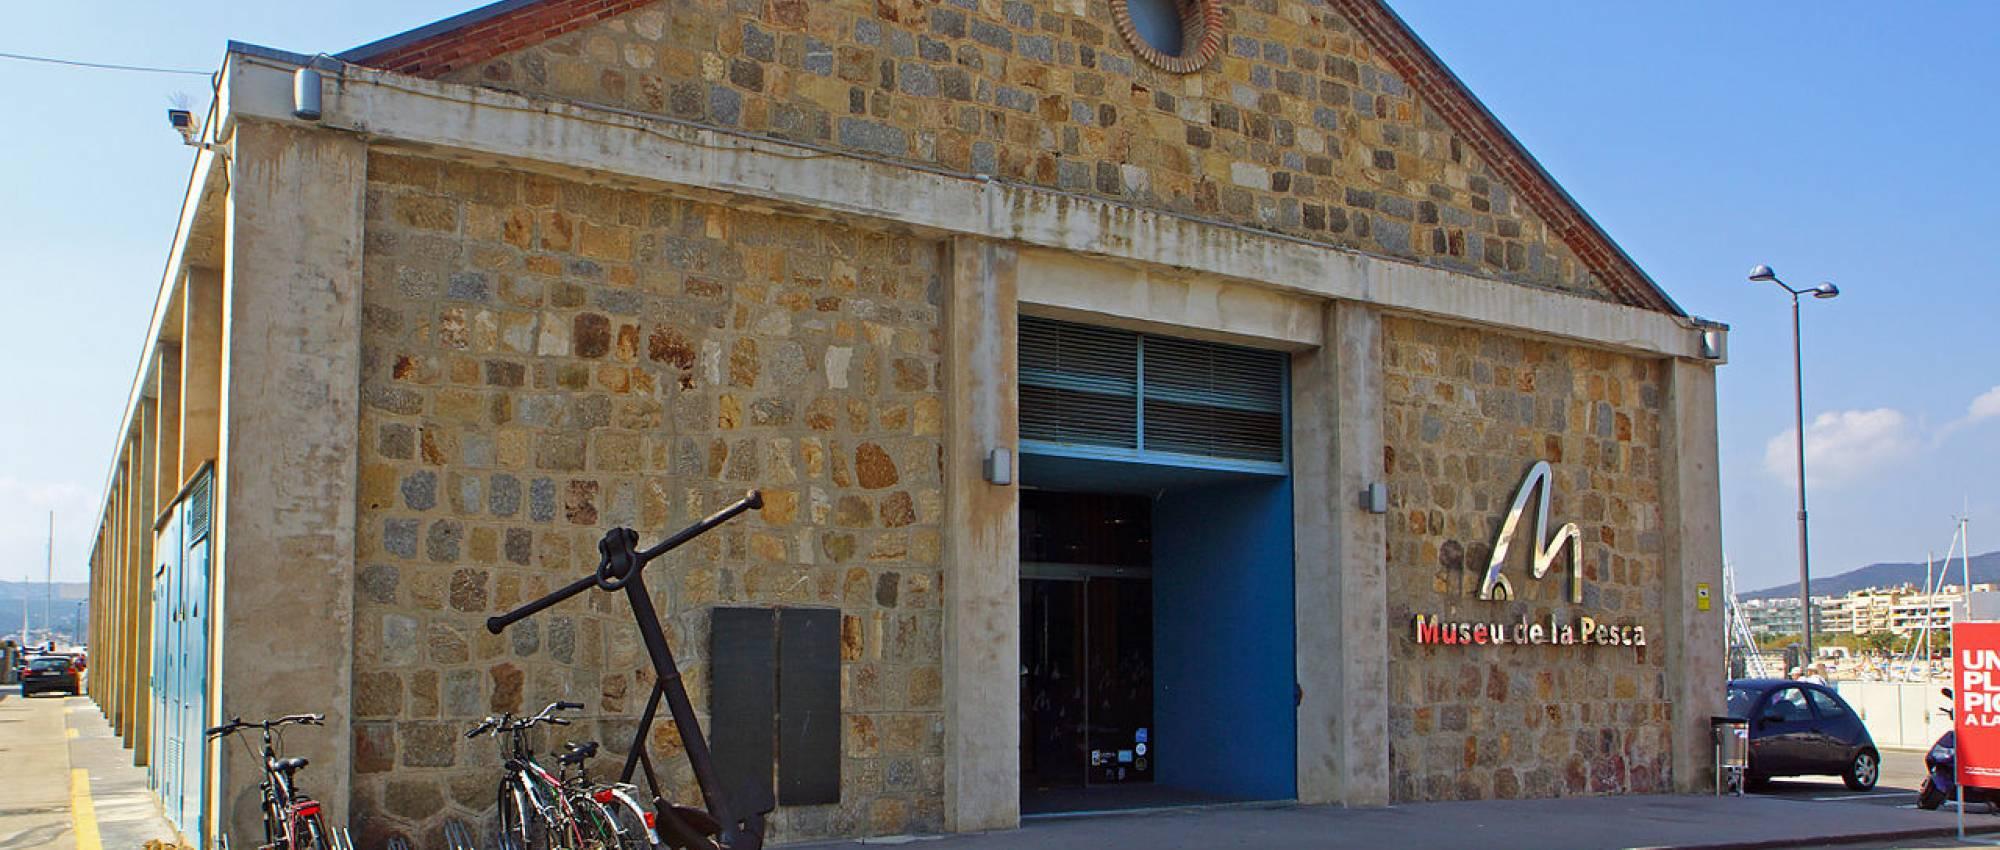 Museu de la Pesca de Palamós. flamenc / Wikimedia Commons. CC BY-SA 3.0